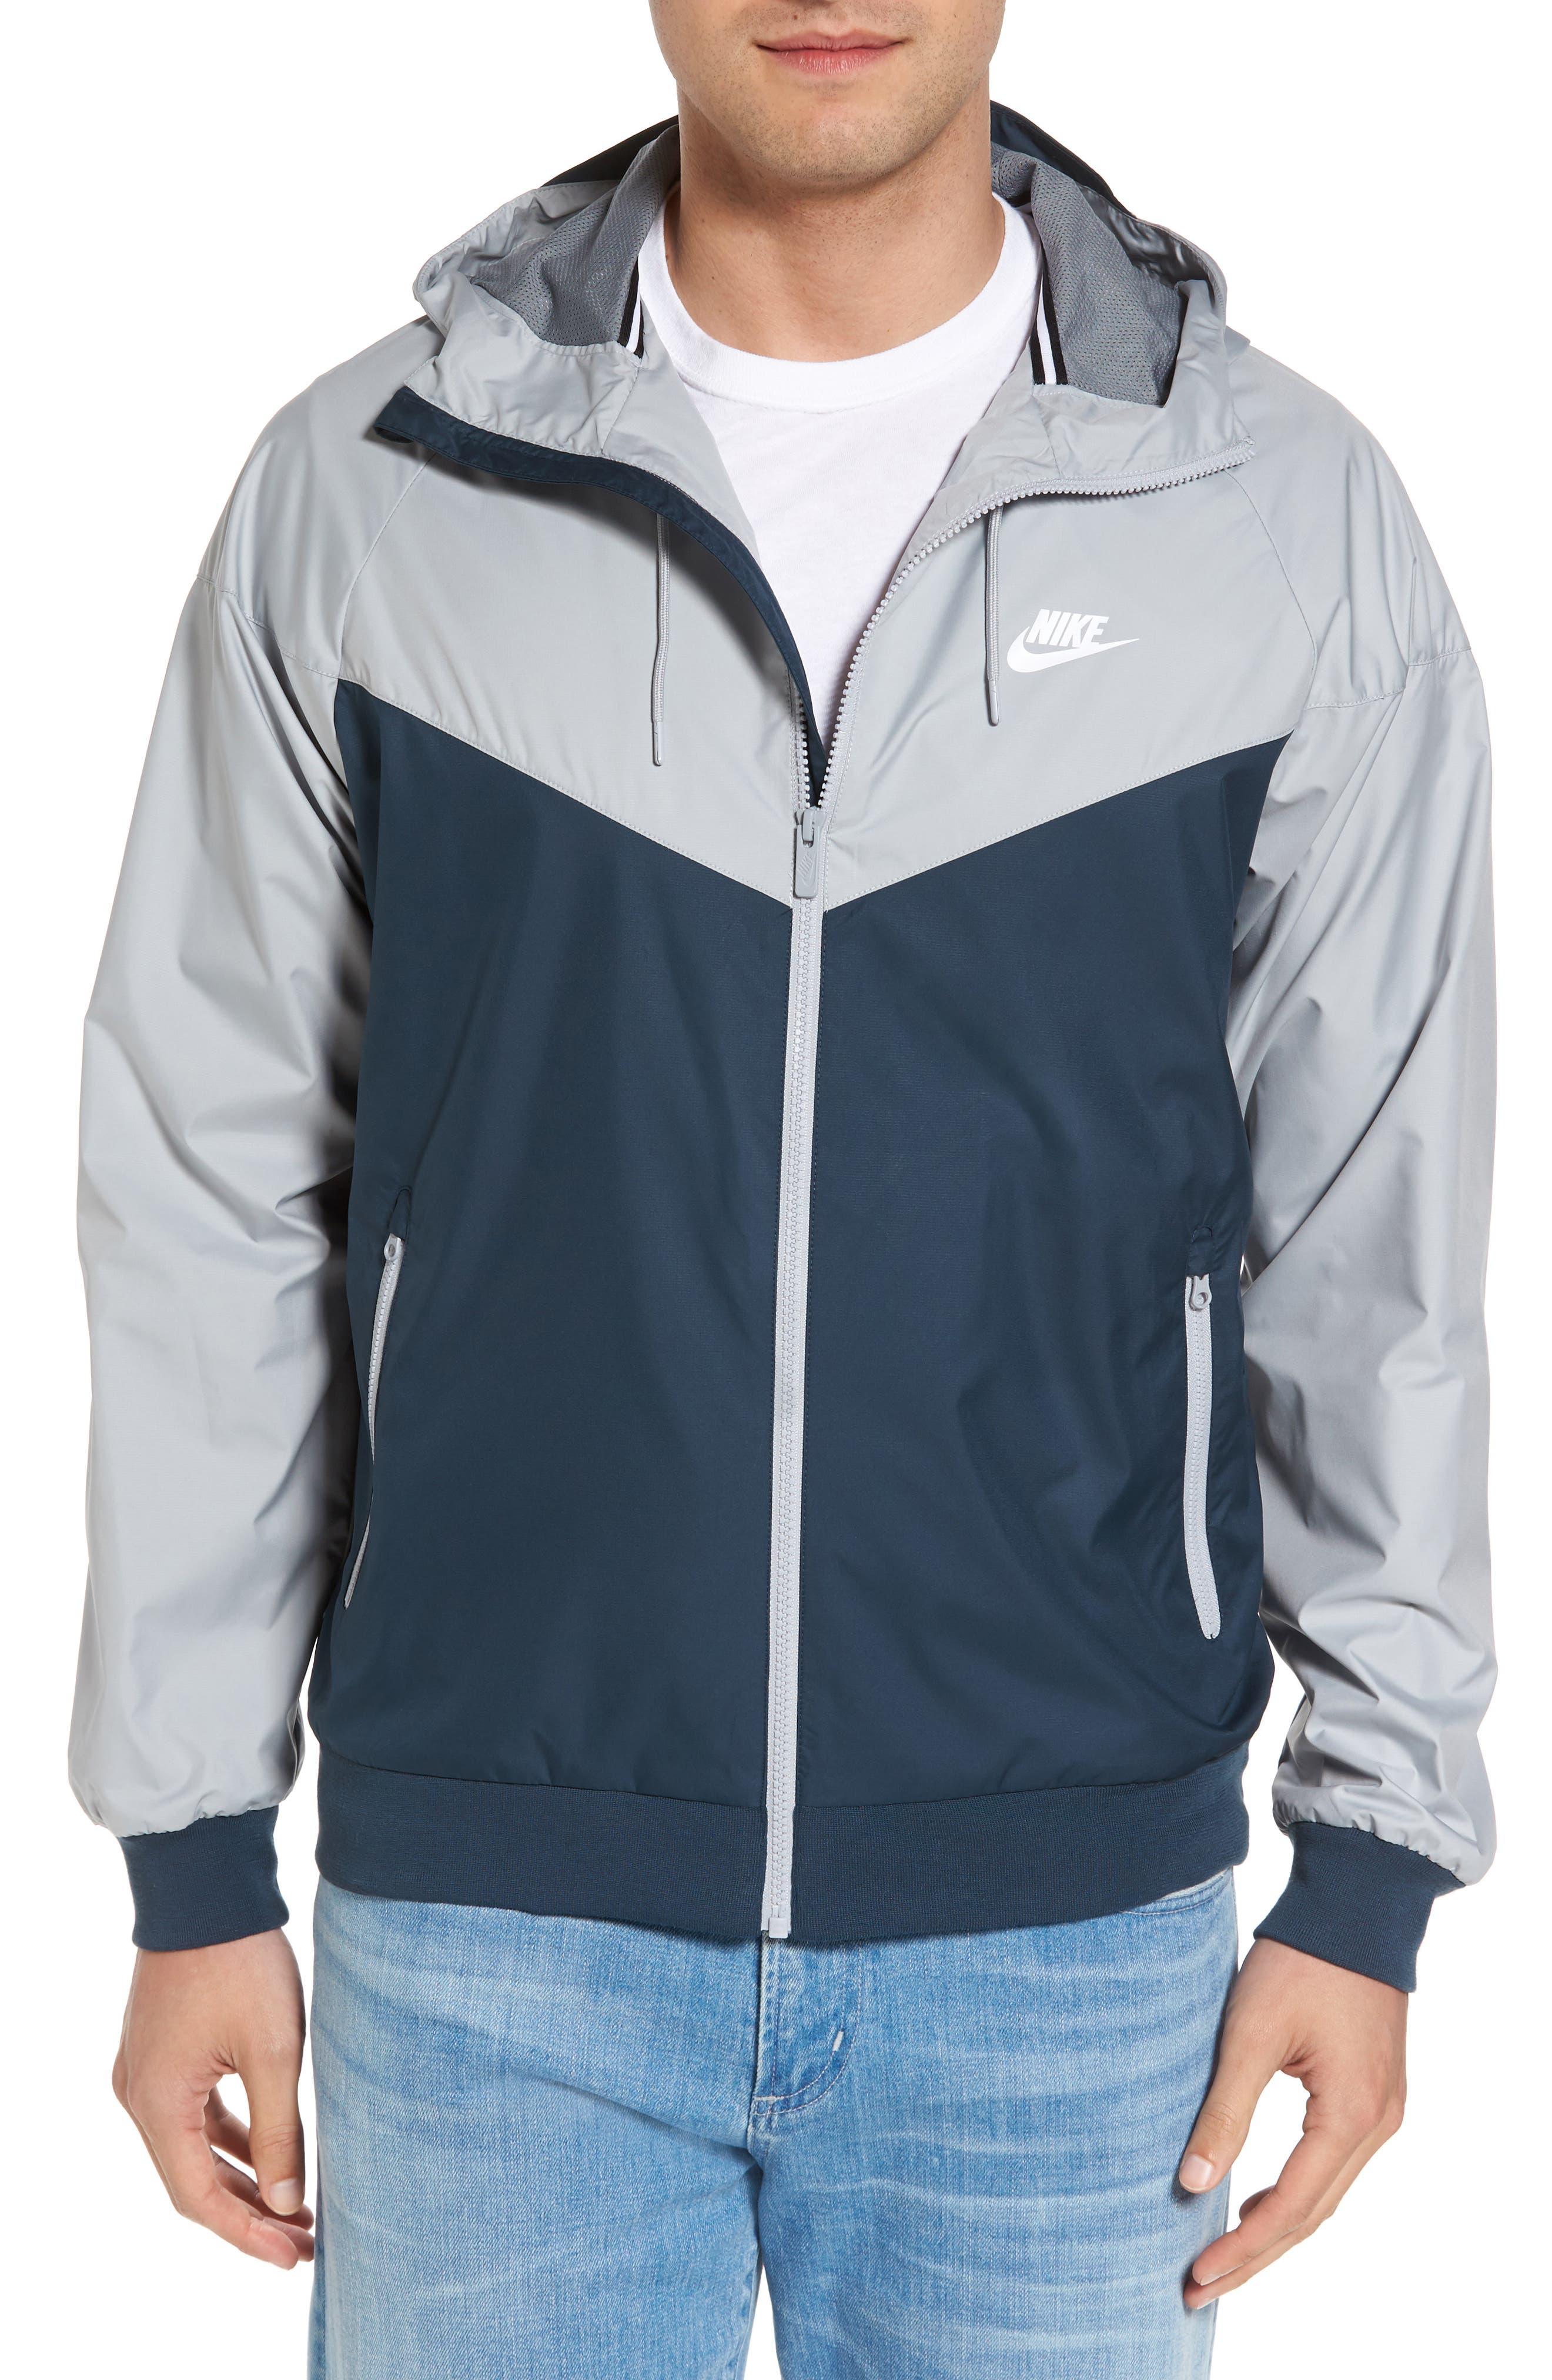 'Windrunner' Colorblock Jacket,                         Main,                         color, GREY/ BLUE